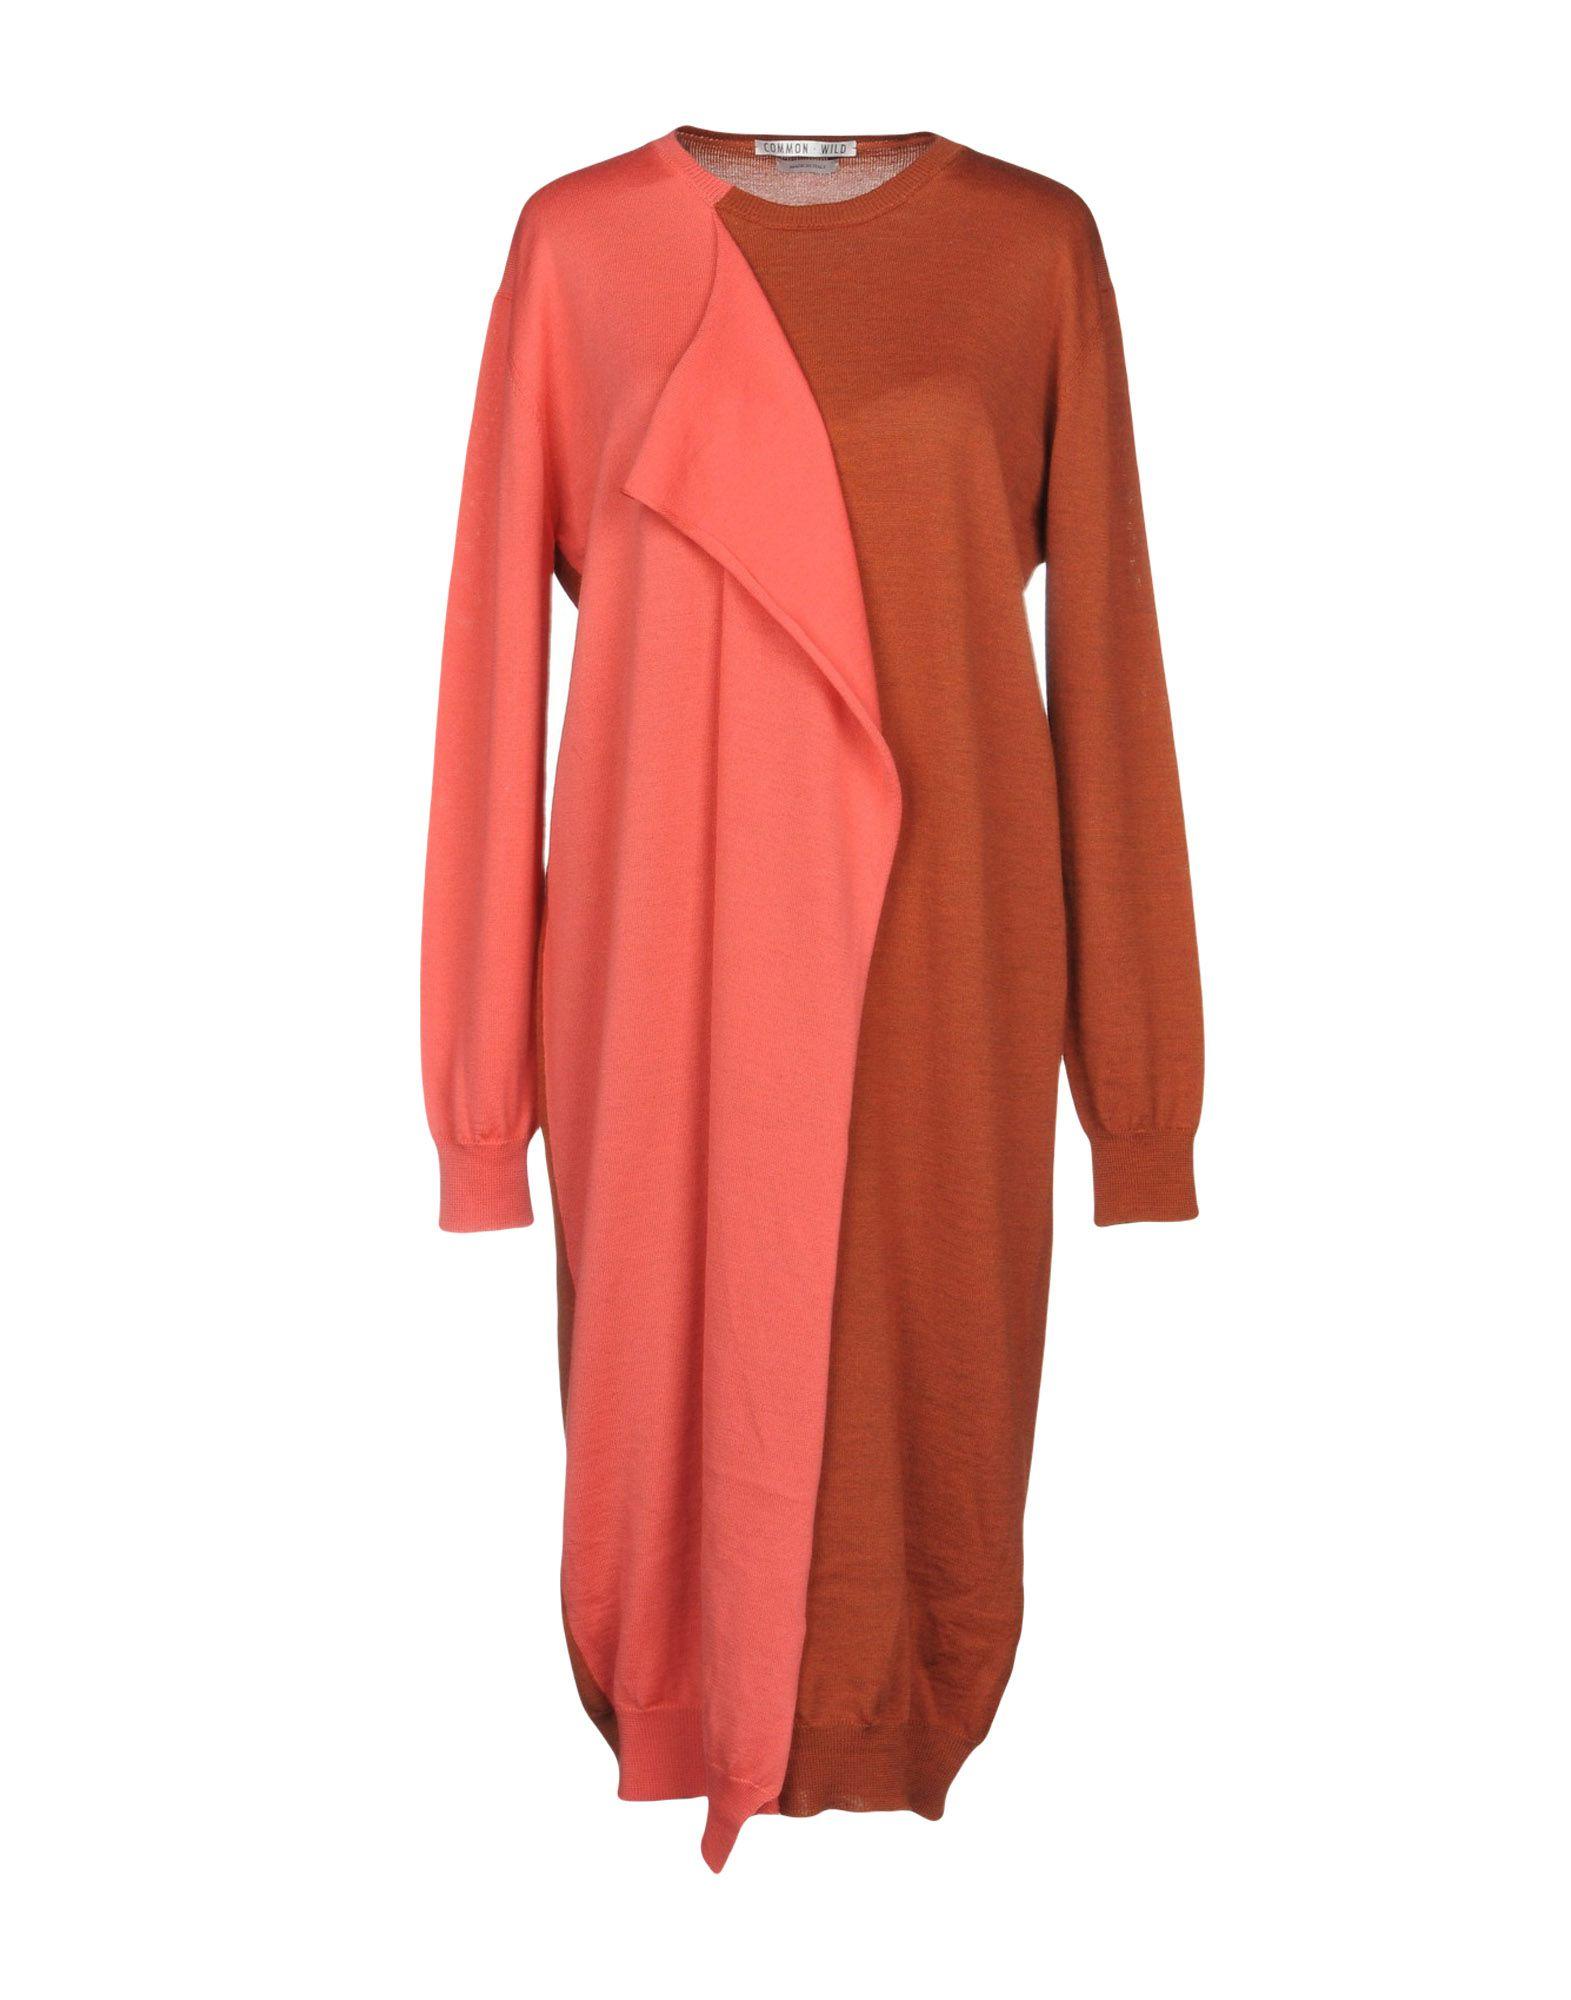 COMMON WILD Knee-Length Dress in Rust